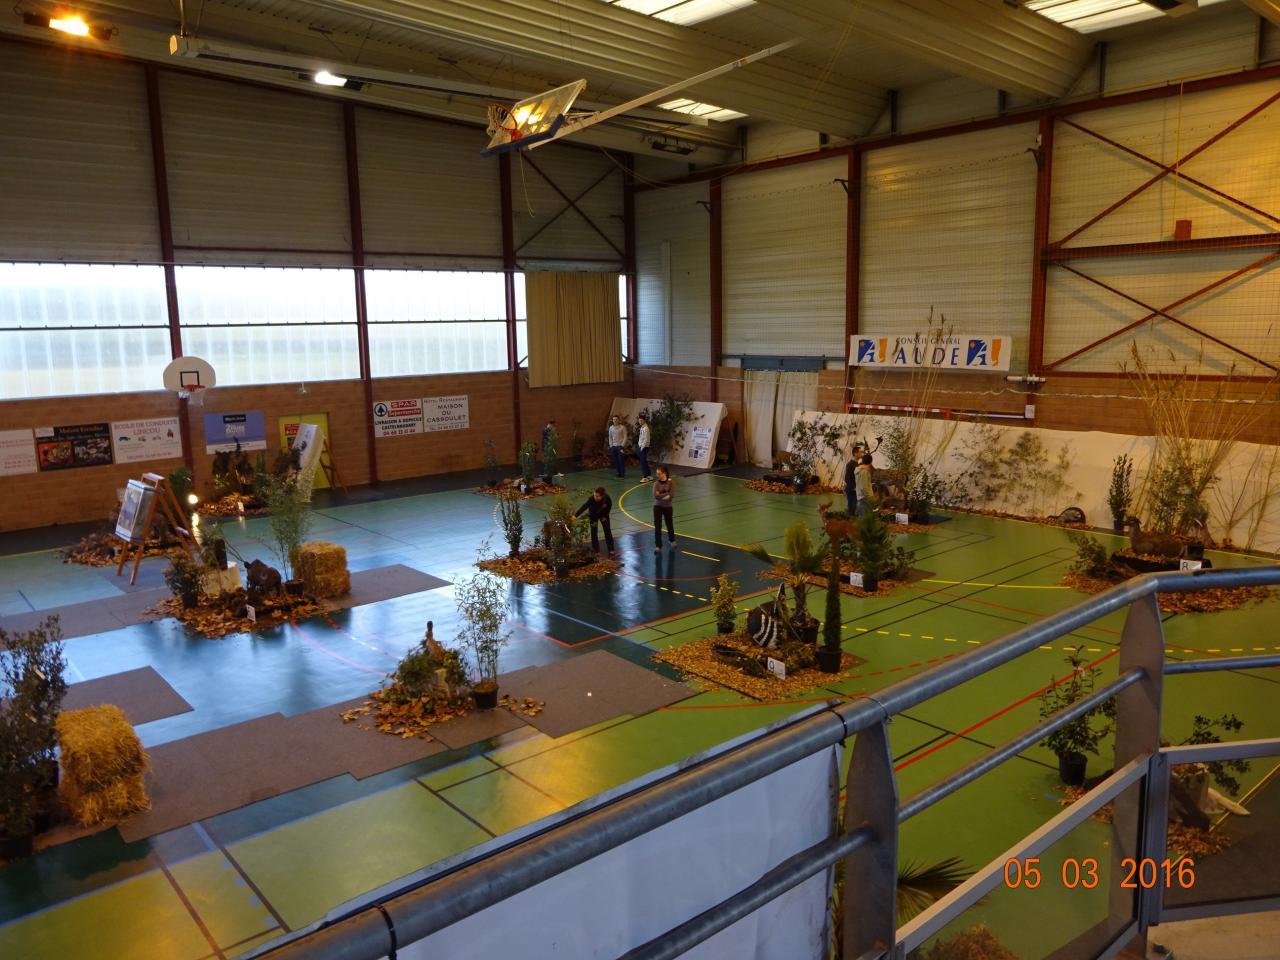 3D indoor Castelnaudary (05/03/16)